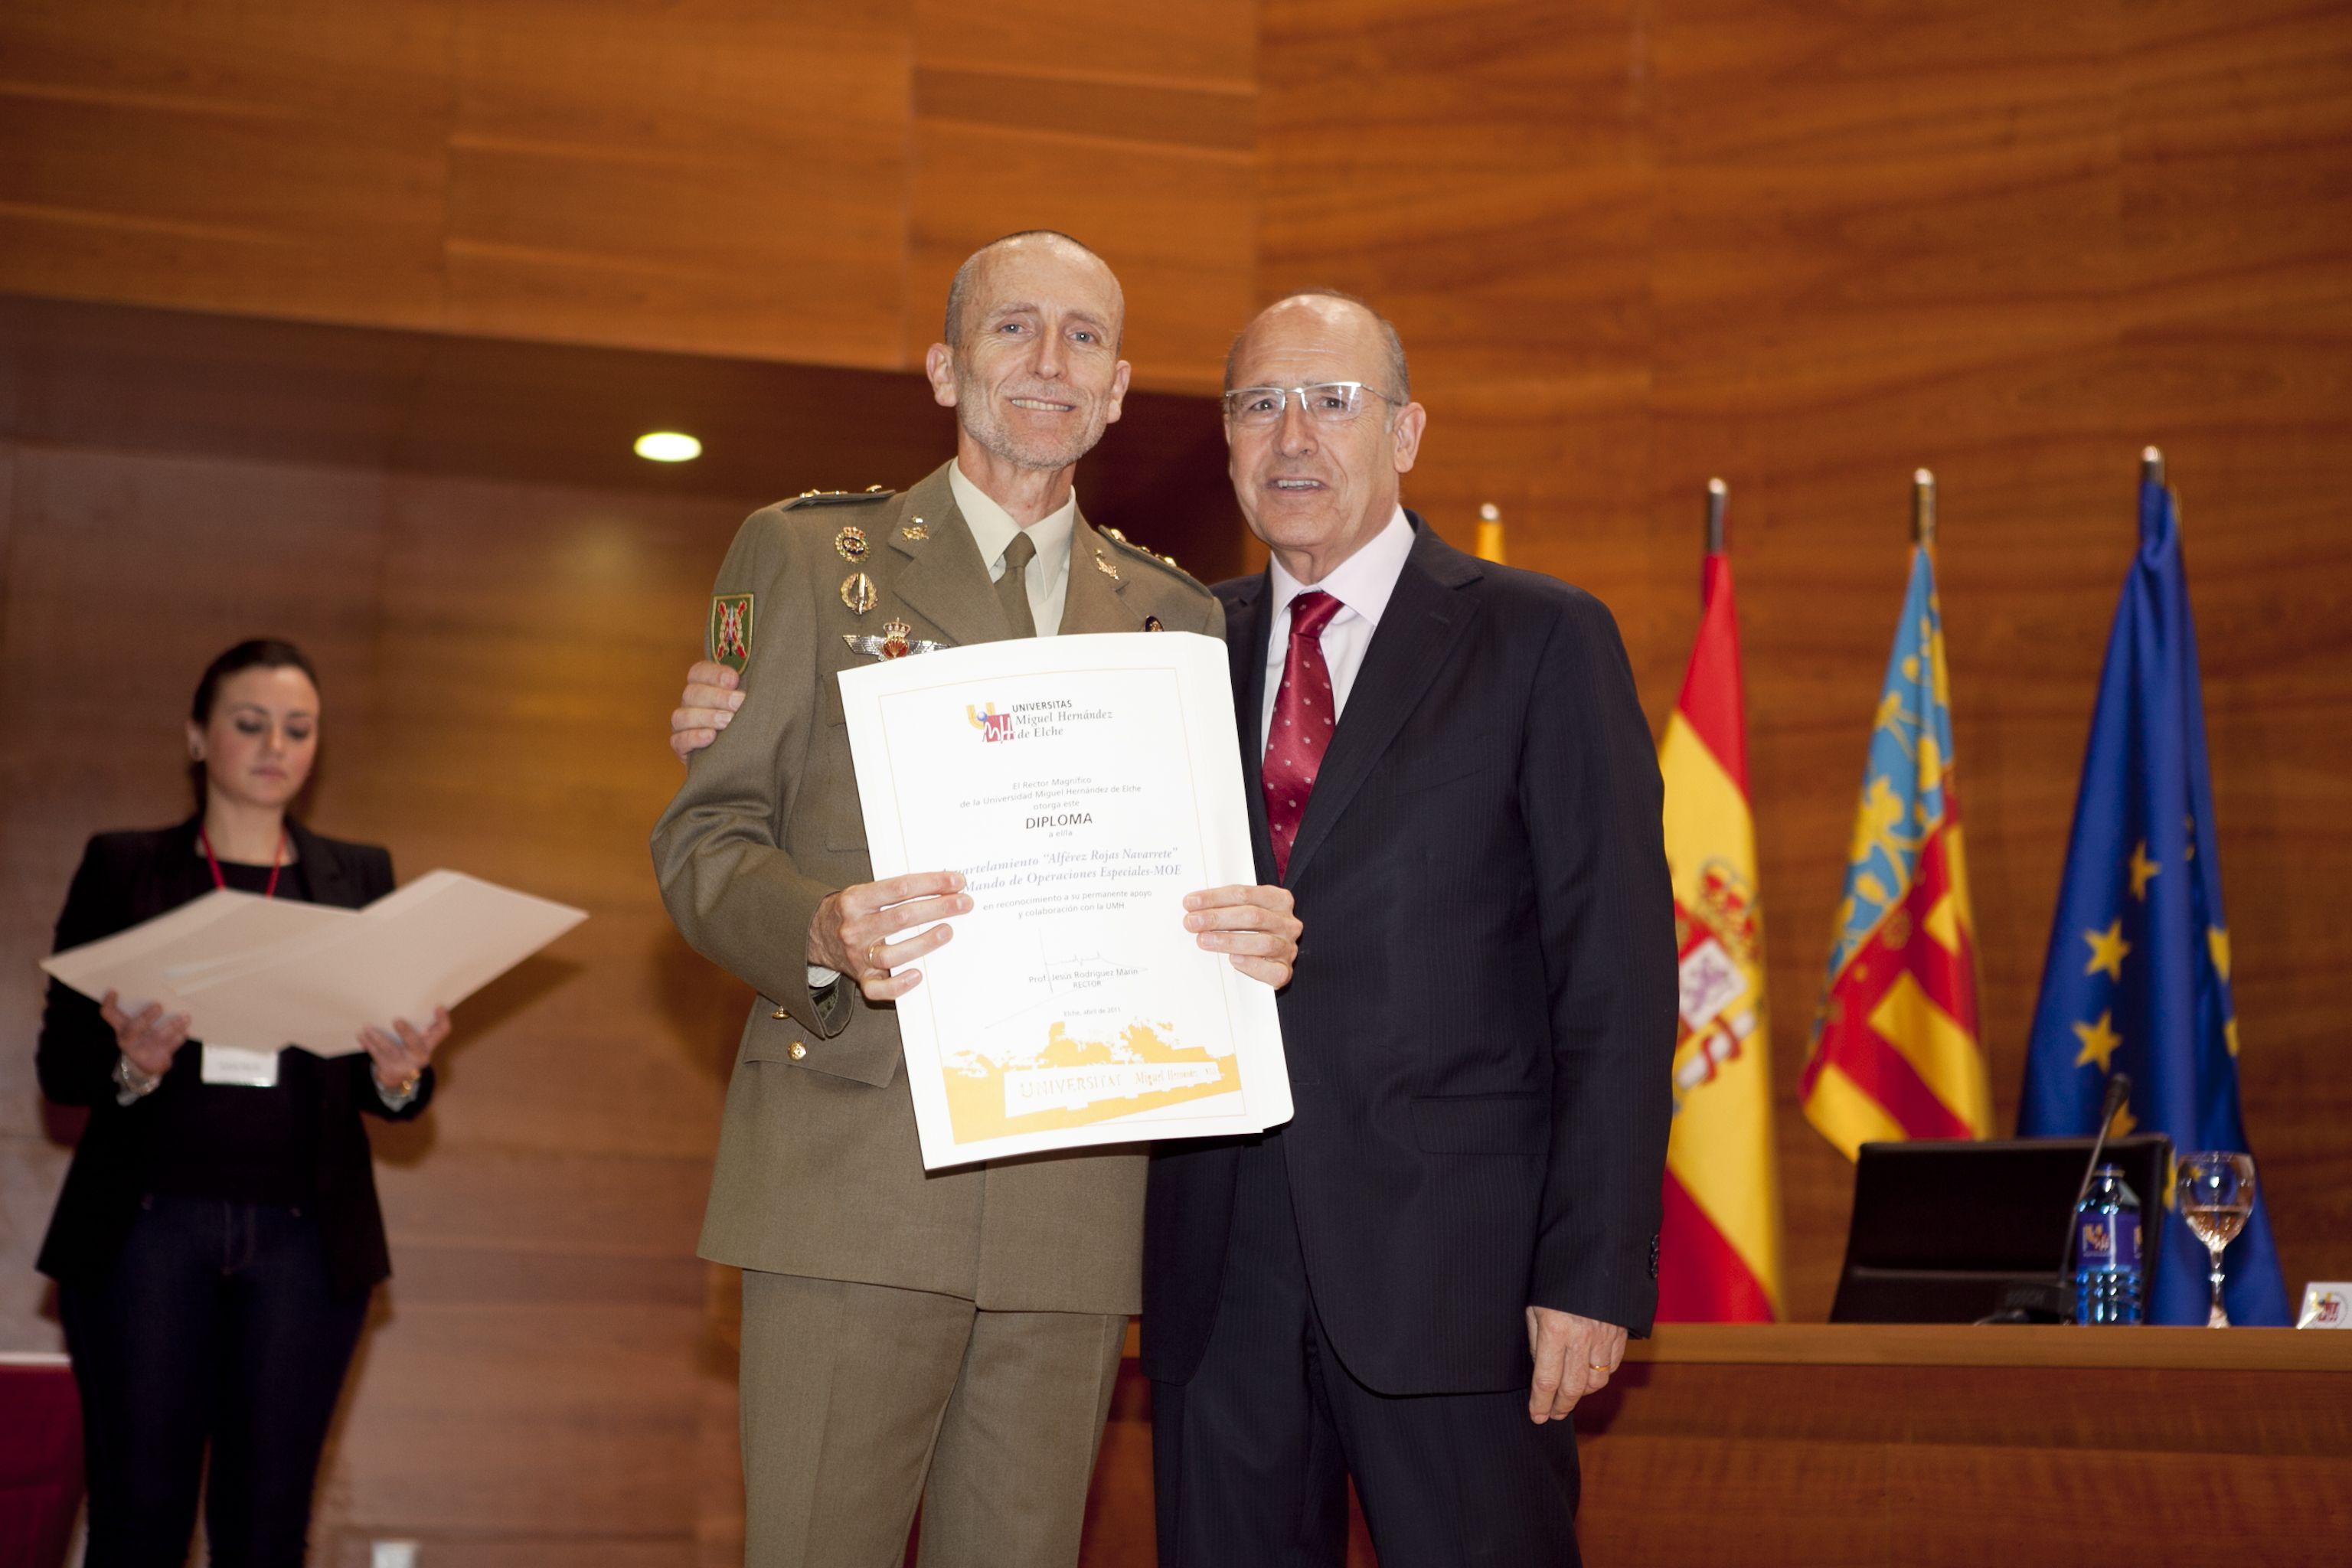 umh-diplomas-rector_mg_6989.jpg